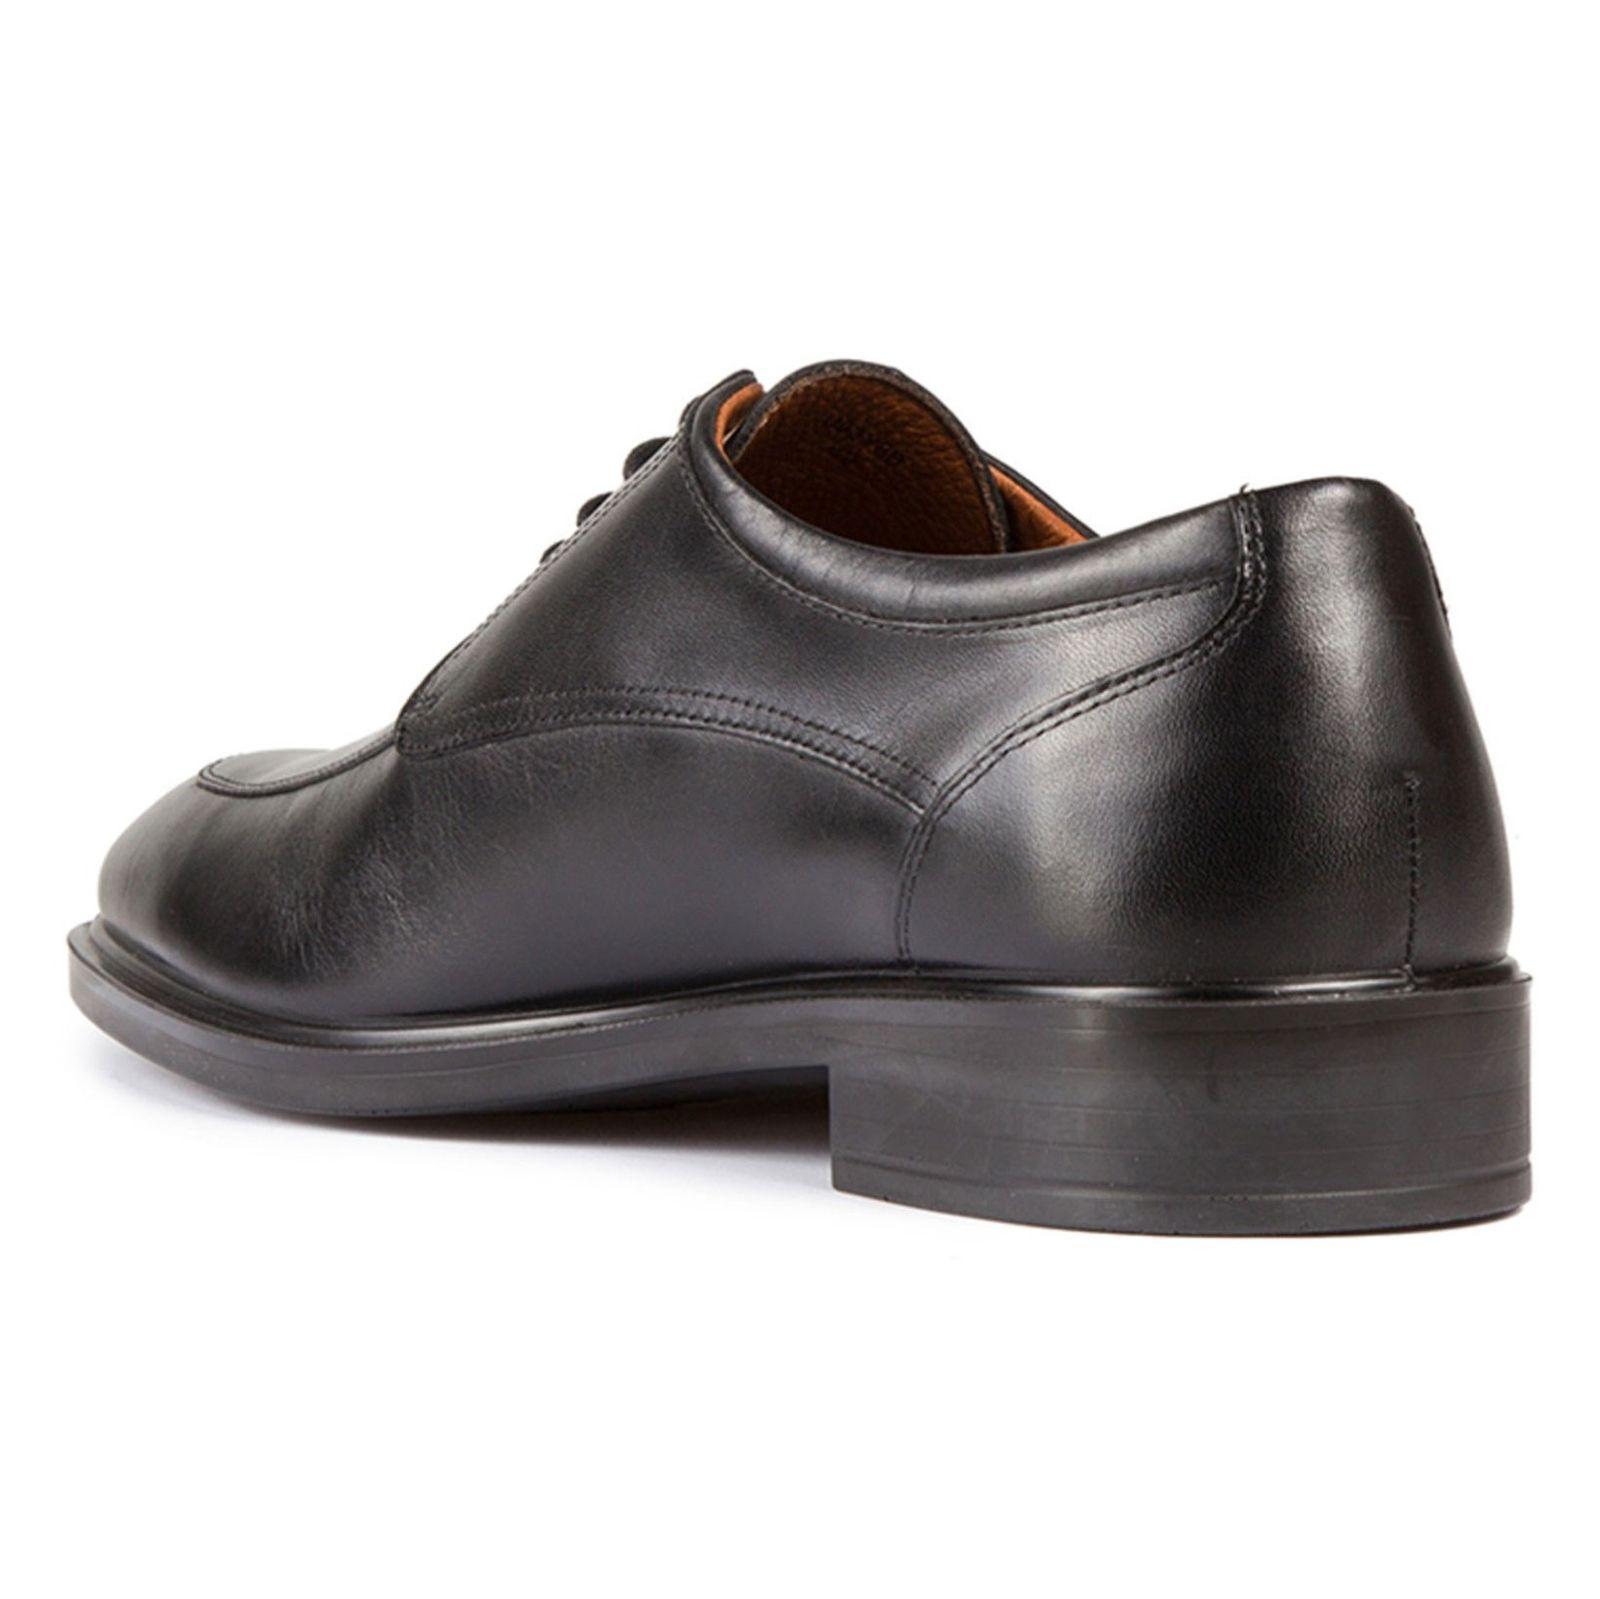 کفش رسمی چرم مردانه - جی اوکس - مشکي - 3